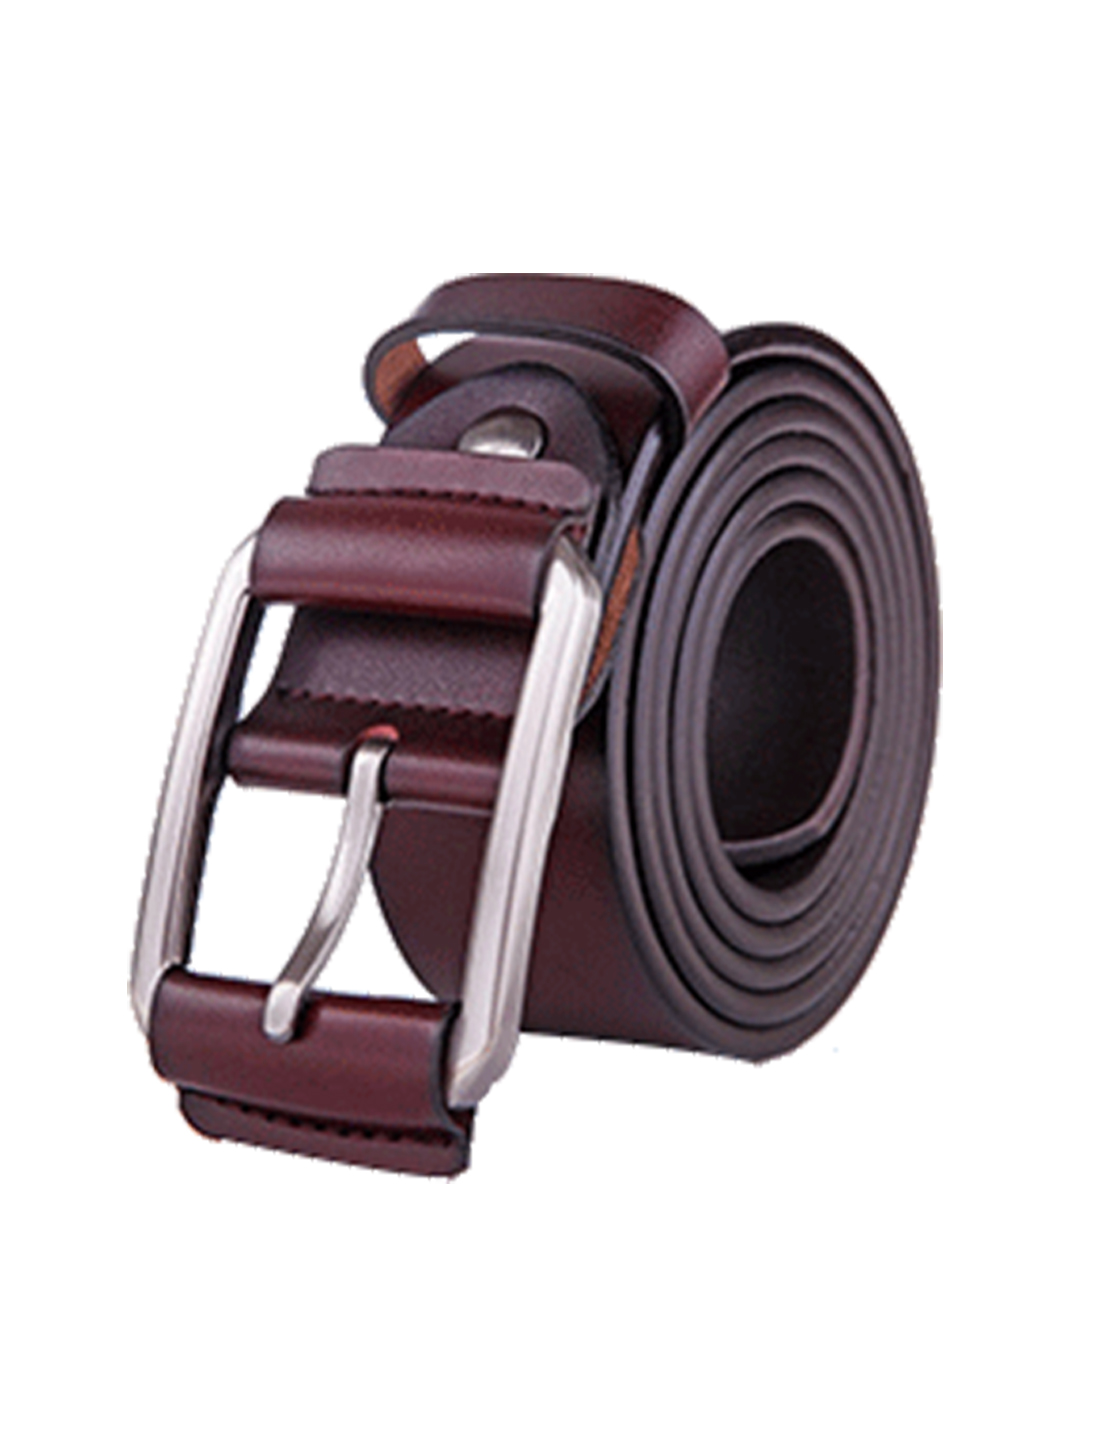 Men Solid Pin Buckle Dress Leather Belt 38mm Width 1 1/2 Brown 120cm